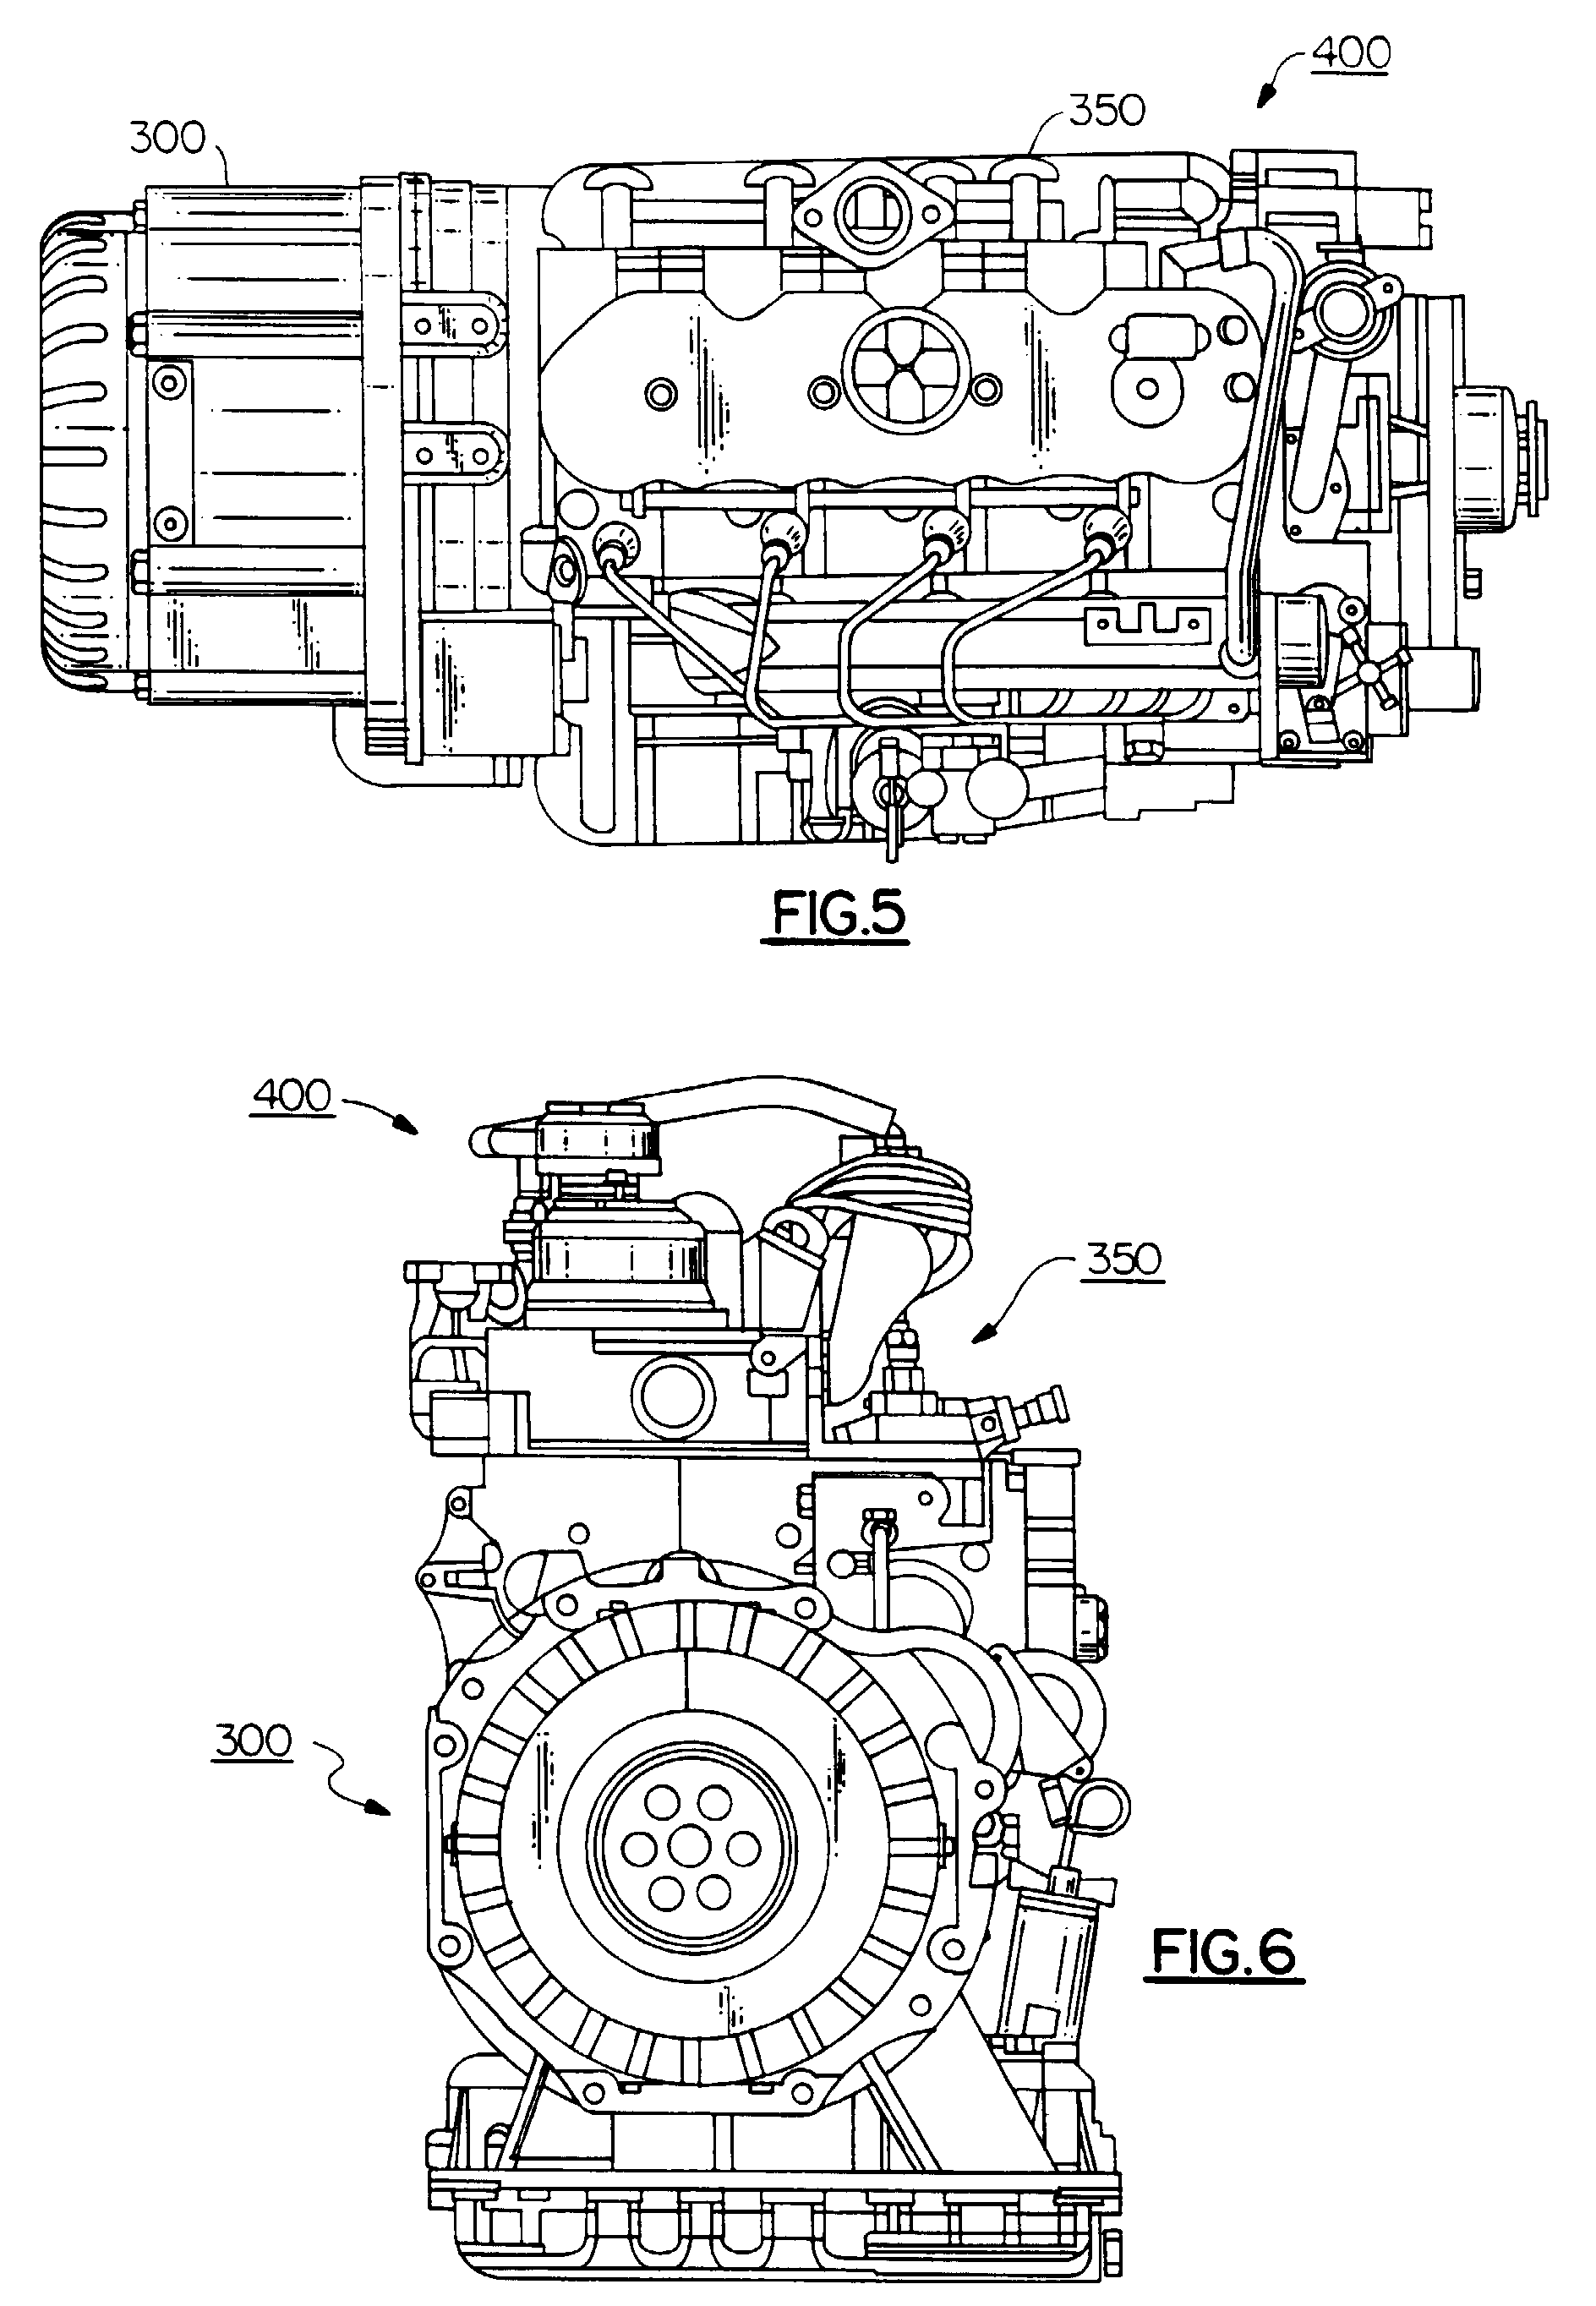 patent ep1046525a2